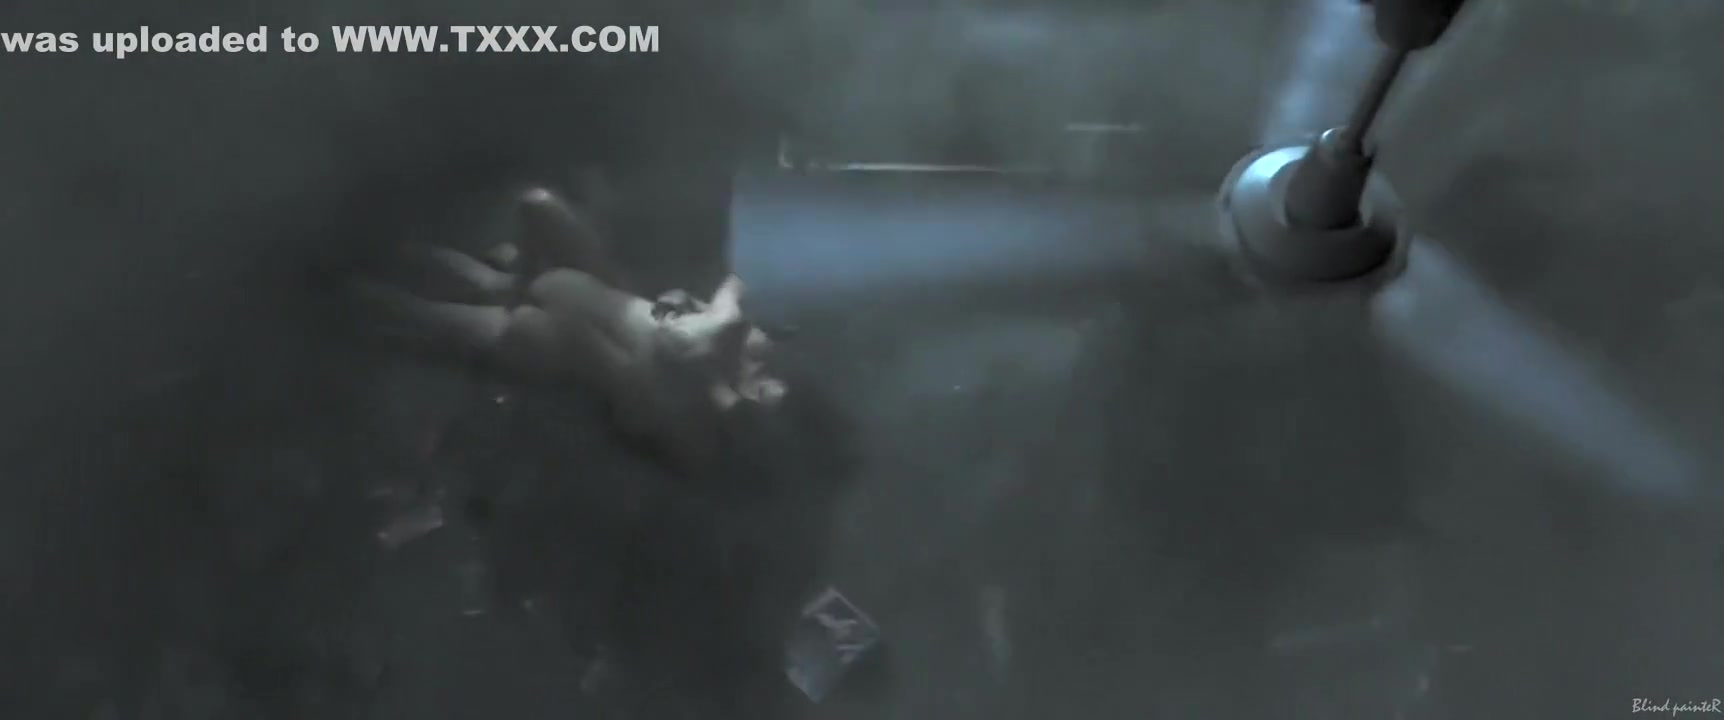 New xXx Video Brazer porn video